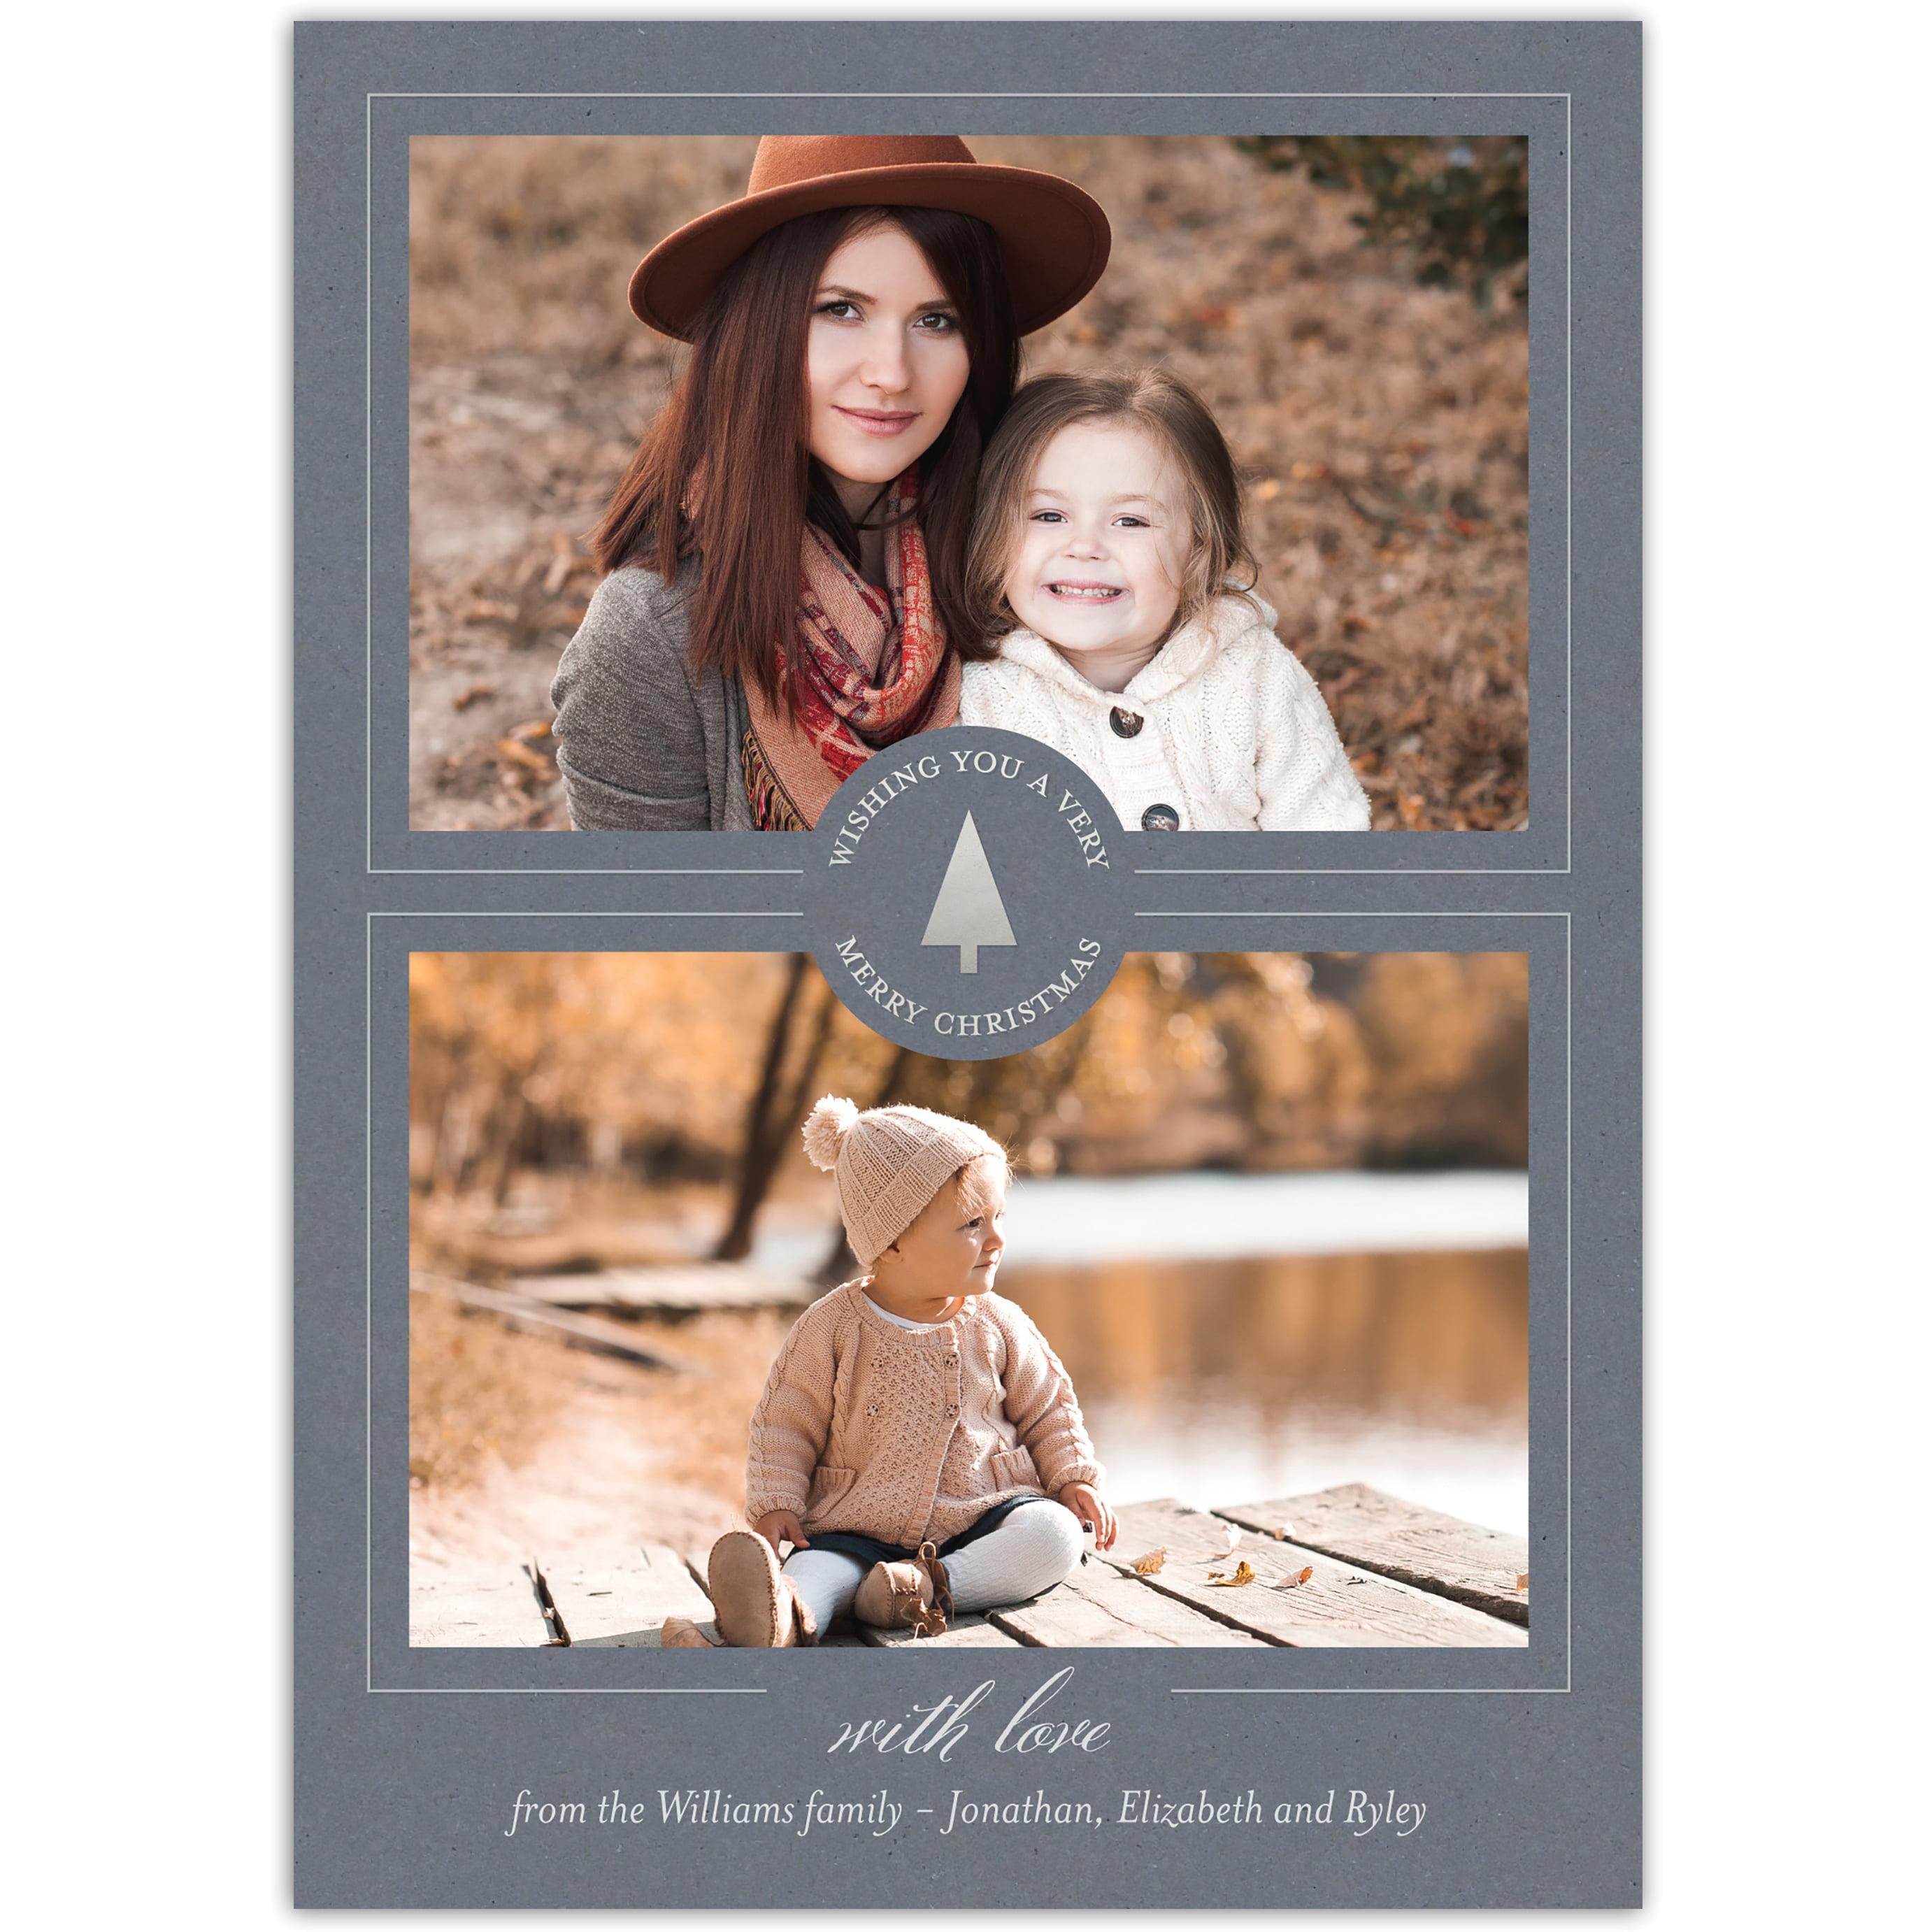 Kraft Foil - 5x7 Personalized Christmas Card